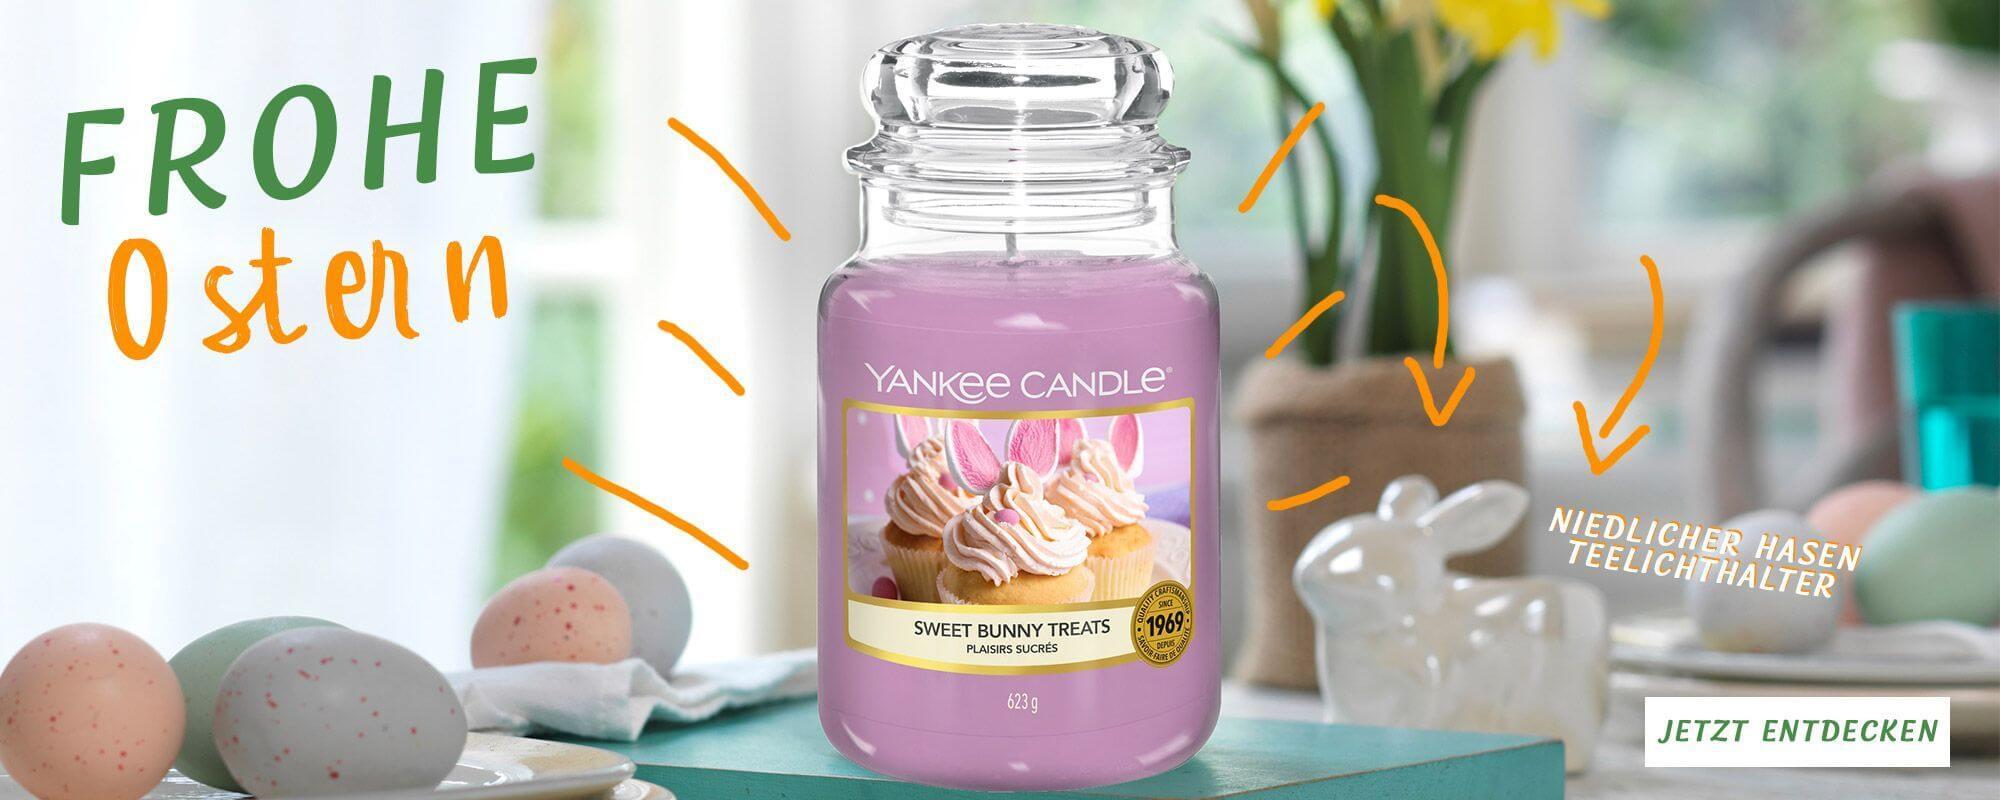 Yankee-Candle-Ostern-2020rff2vzZBtr56C